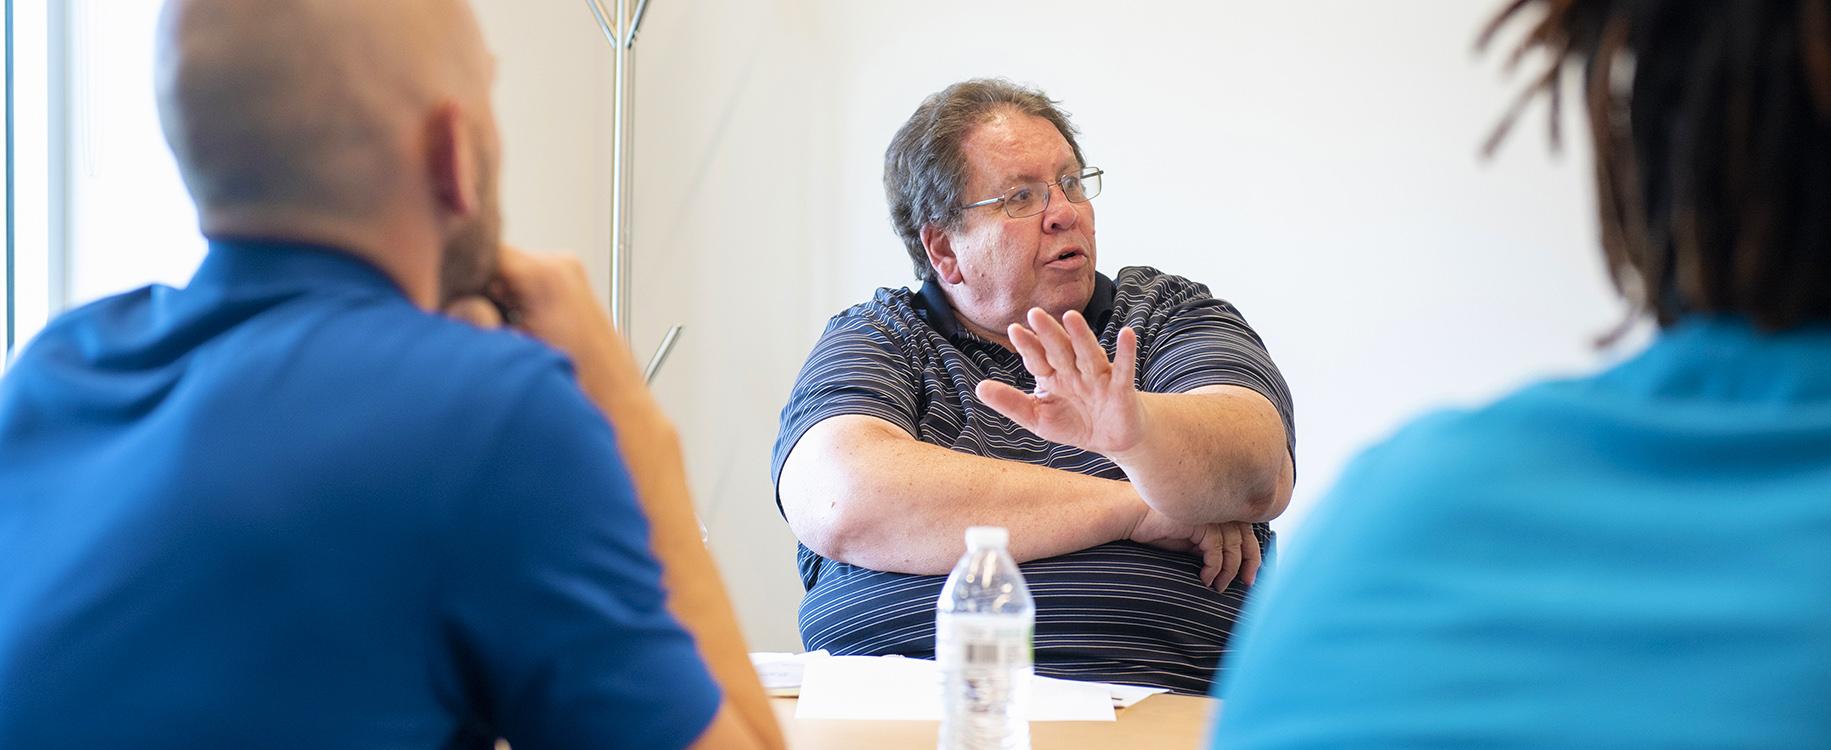 Entrepreneurs participate in Igniteís Ideas 2 Enterprise program led by Max Miller, June 23, 2021 on the campus of Washington & Jefferson College in Washington, Pa.